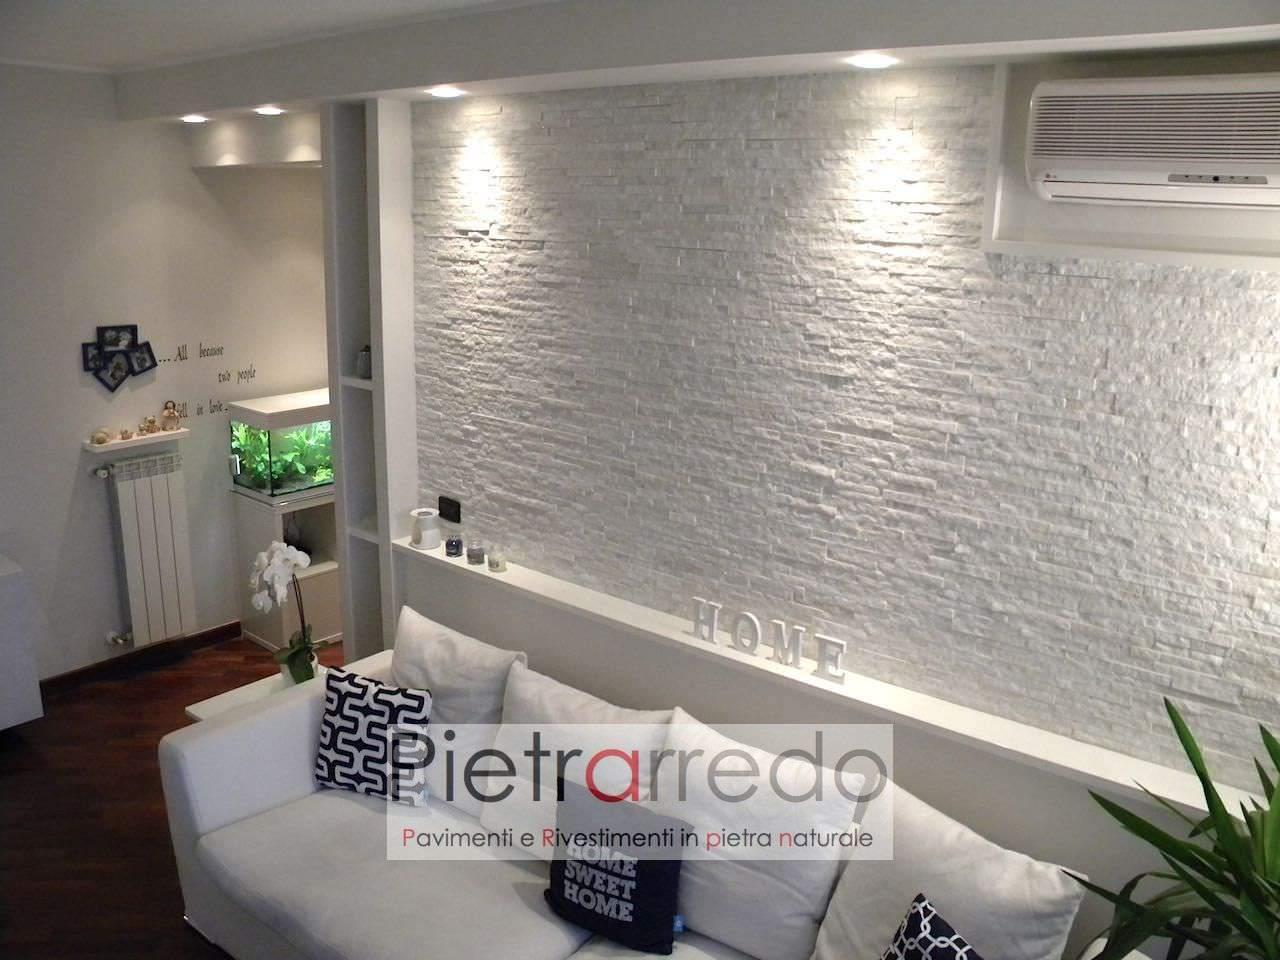 Rivestimento pietra quarzite bianca 50 43 metro quadro - Listelli decorativi per bagno ...